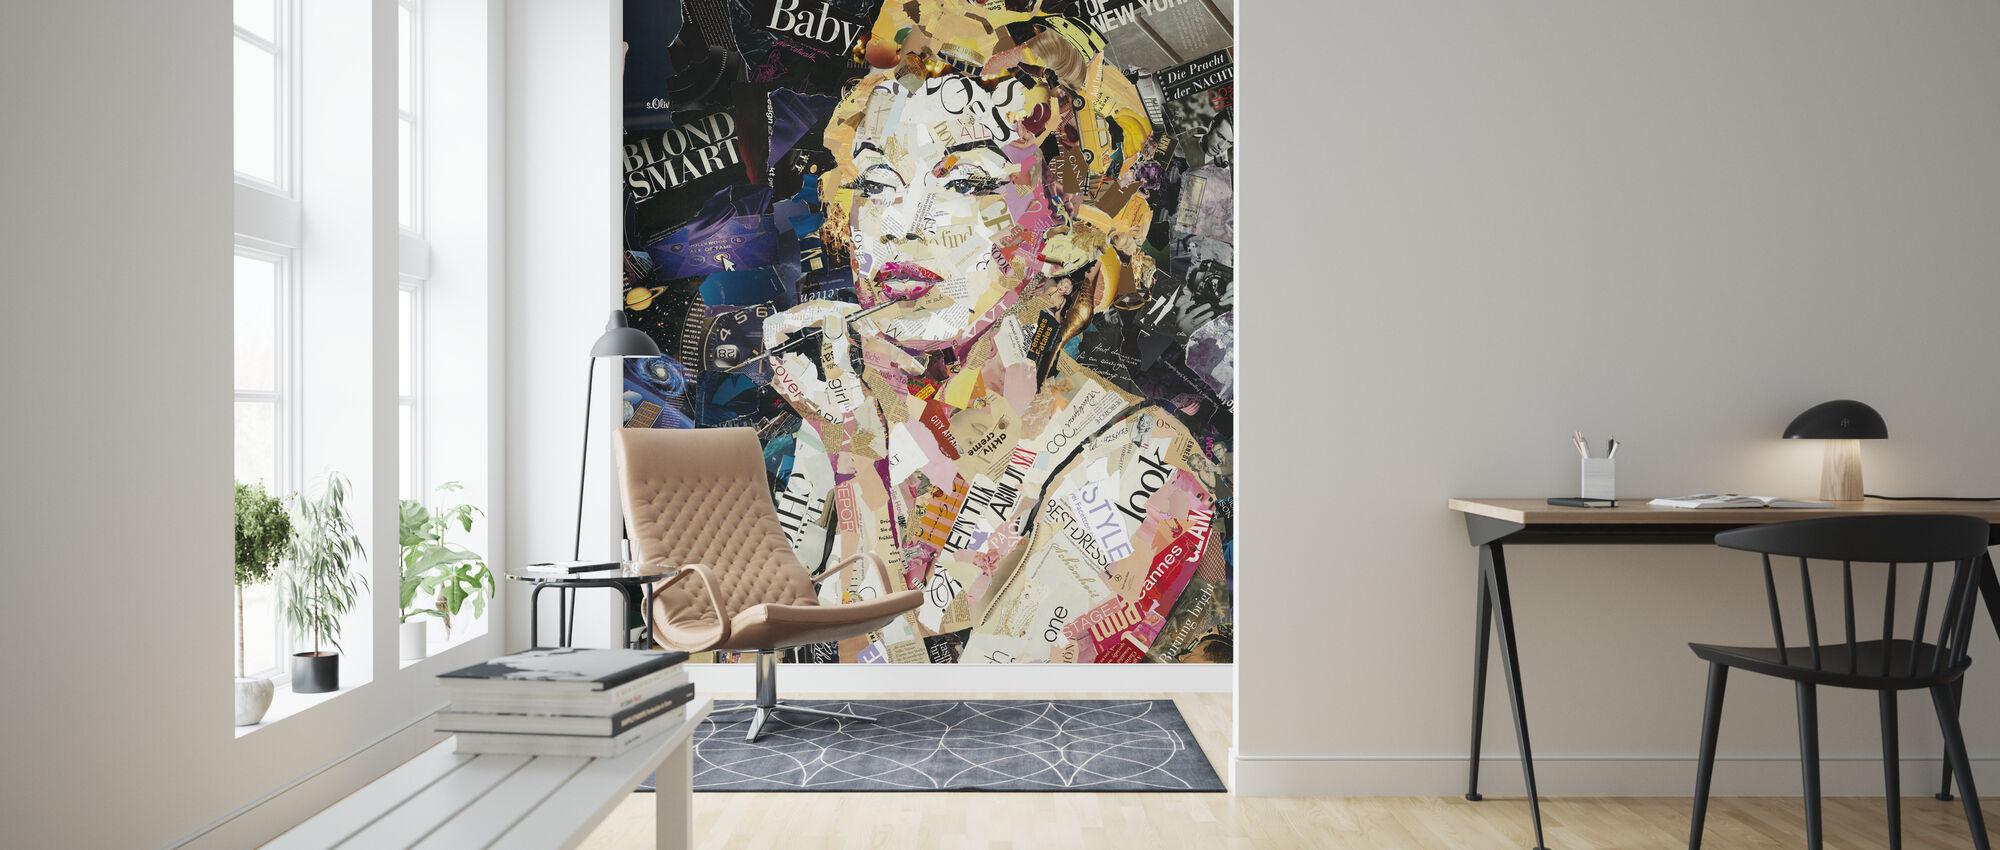 Blond Smart baby - Wallpaper - Living Room